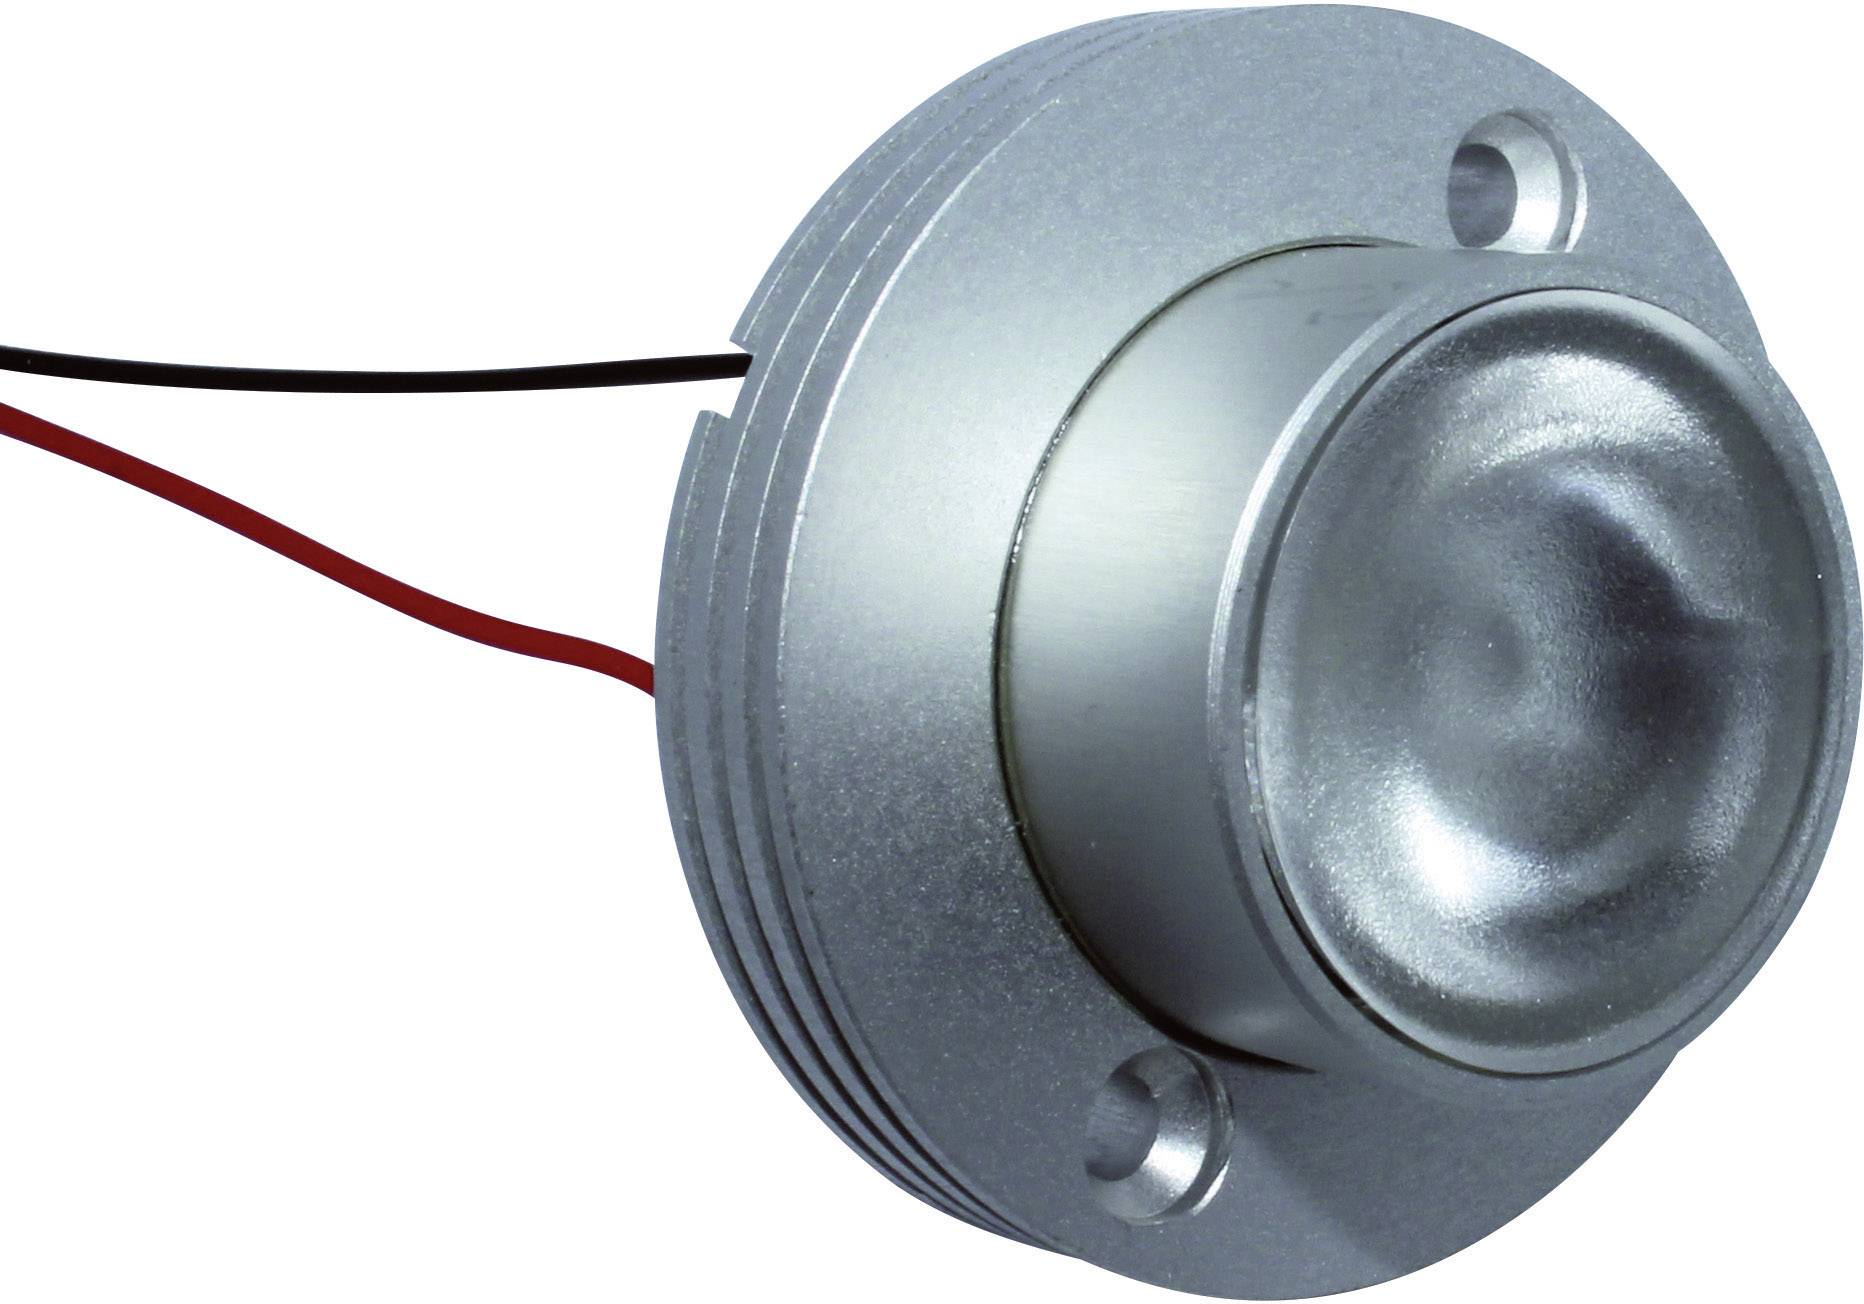 HighPower LED-spot Signal Construct QAUR1331L030, 30 °, 80 lm, 1 W, 3.3 V, jantárová